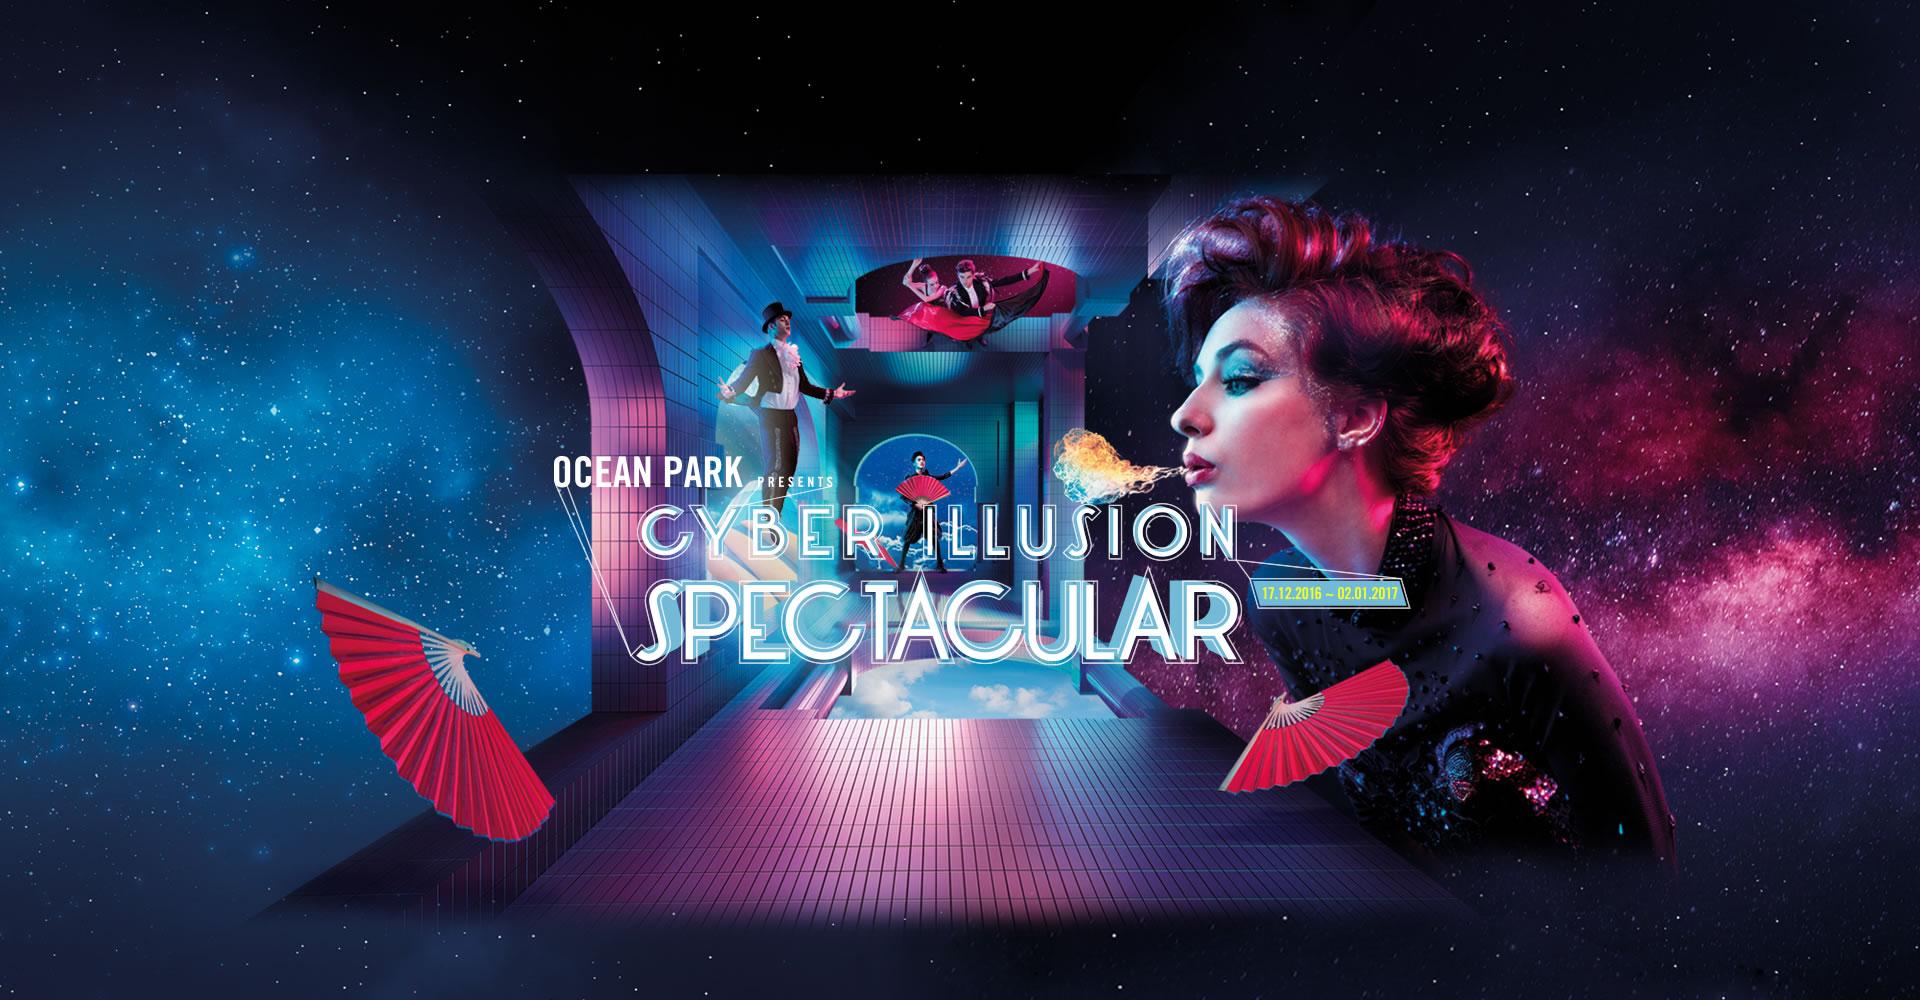 OP Cyber Illusion Spectular